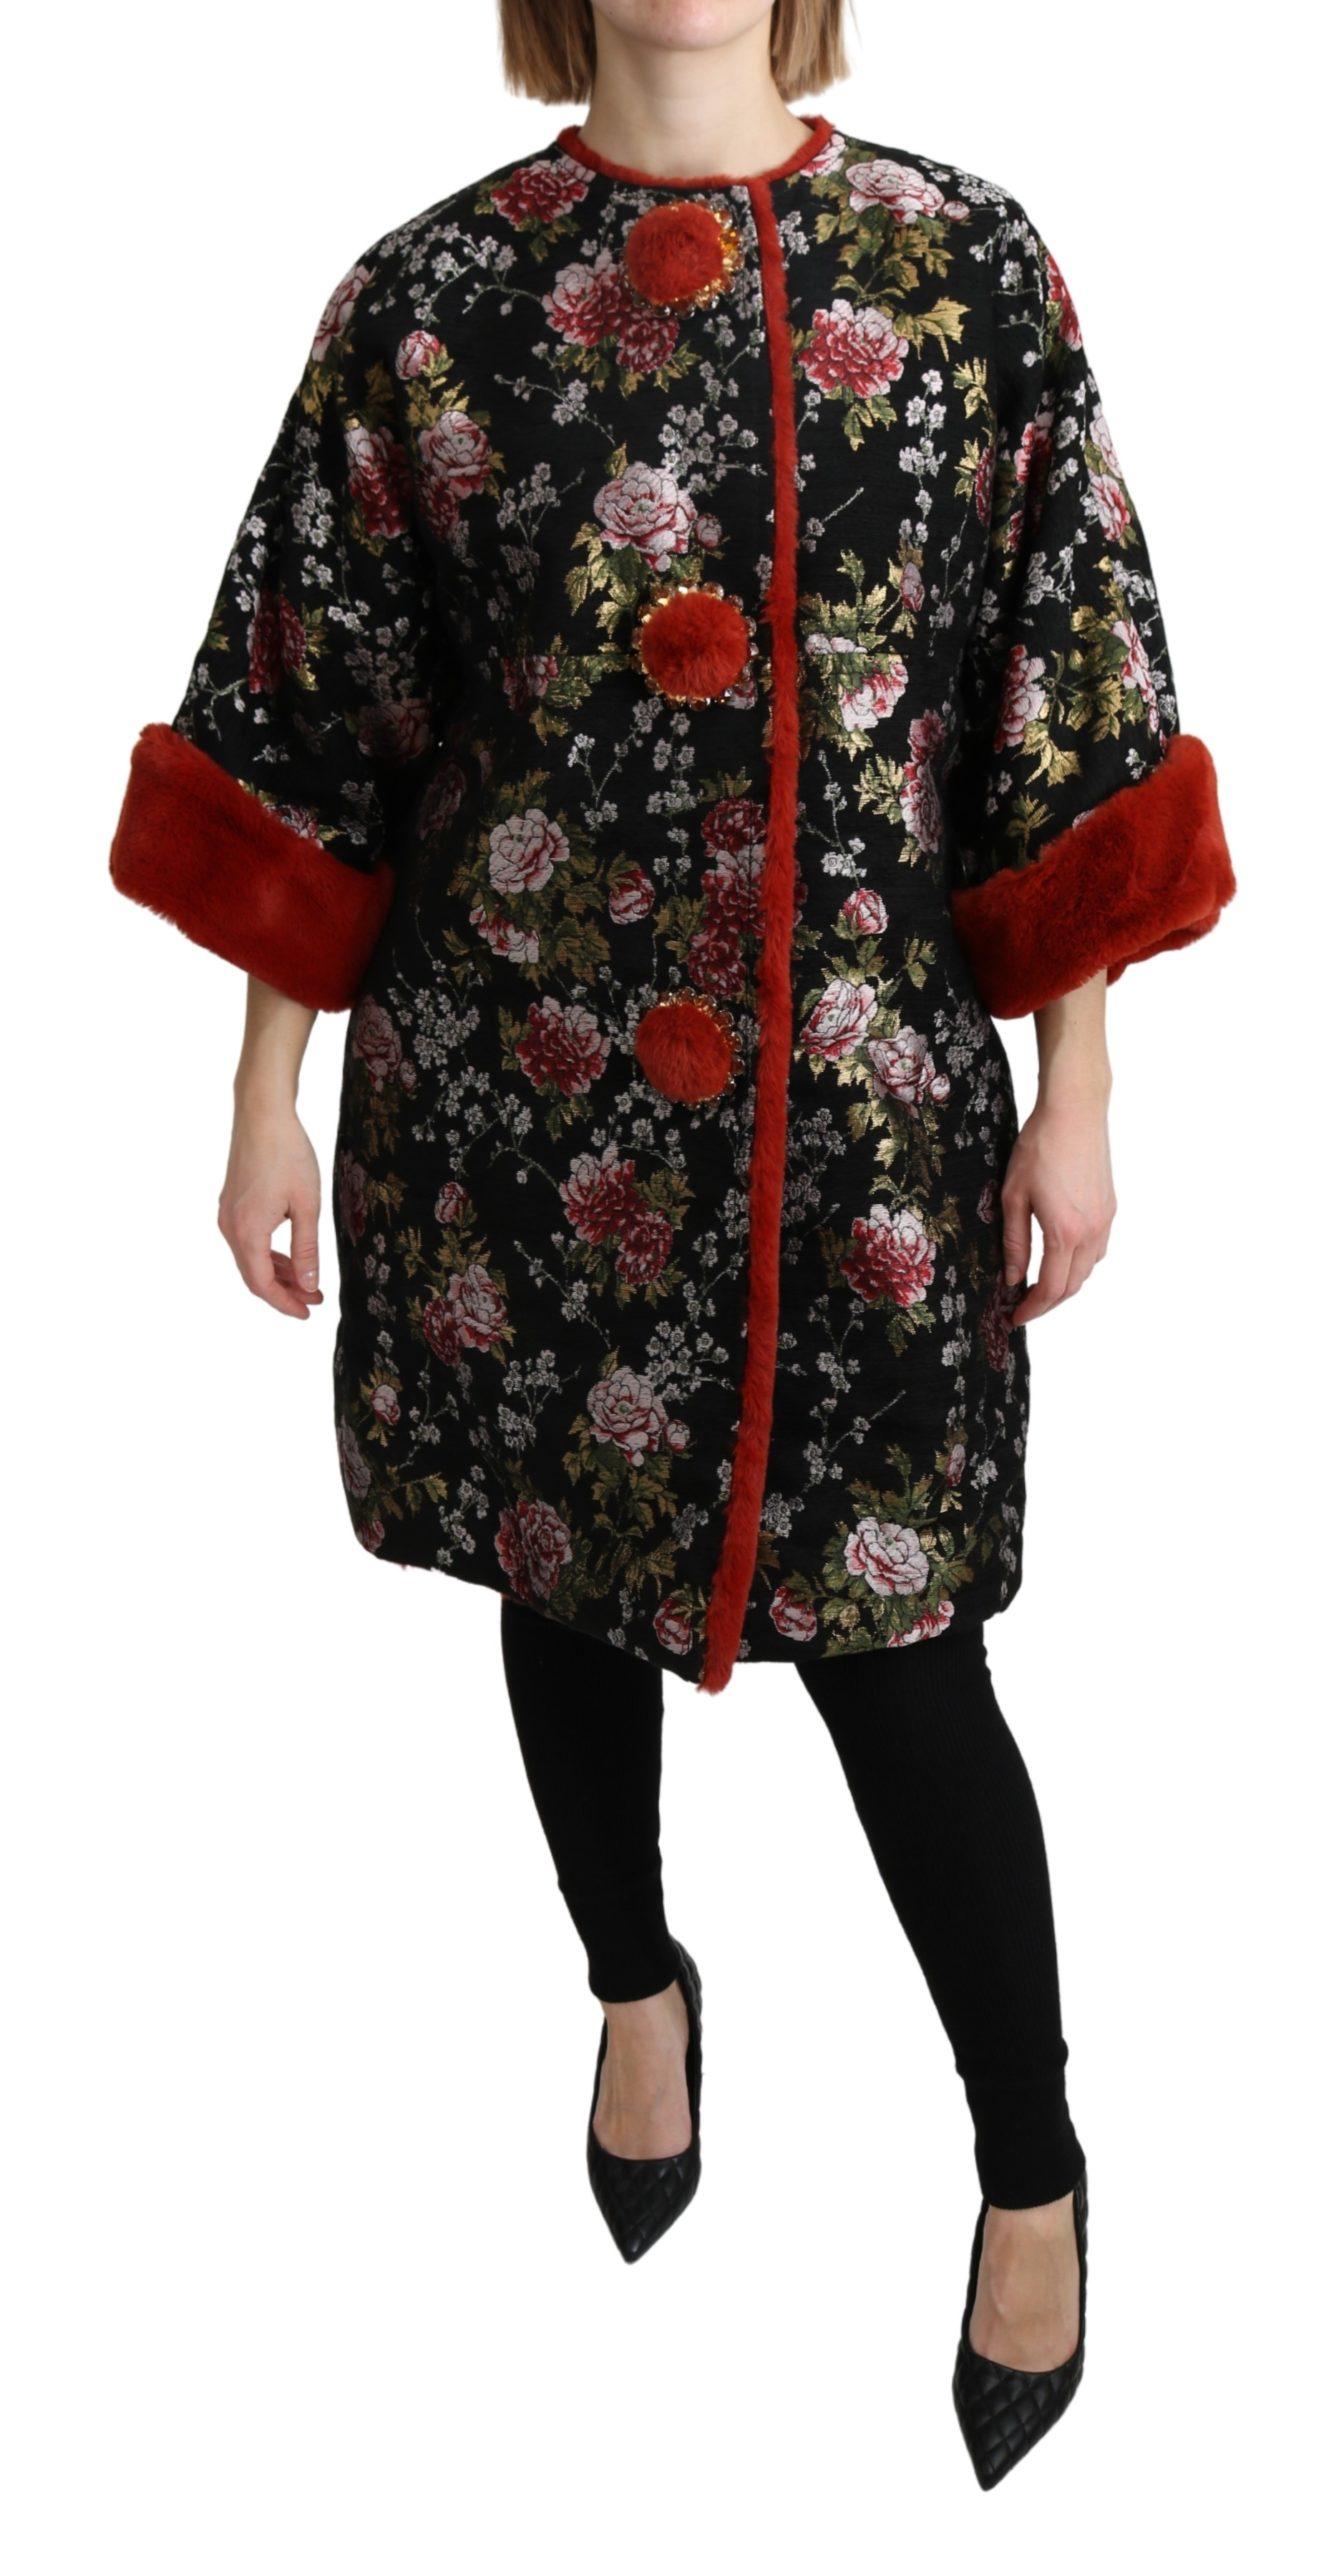 Dolce & Gabbana Women's Floral Fur Crustal Jacket Multicolor JKT2633 - IT38 | S